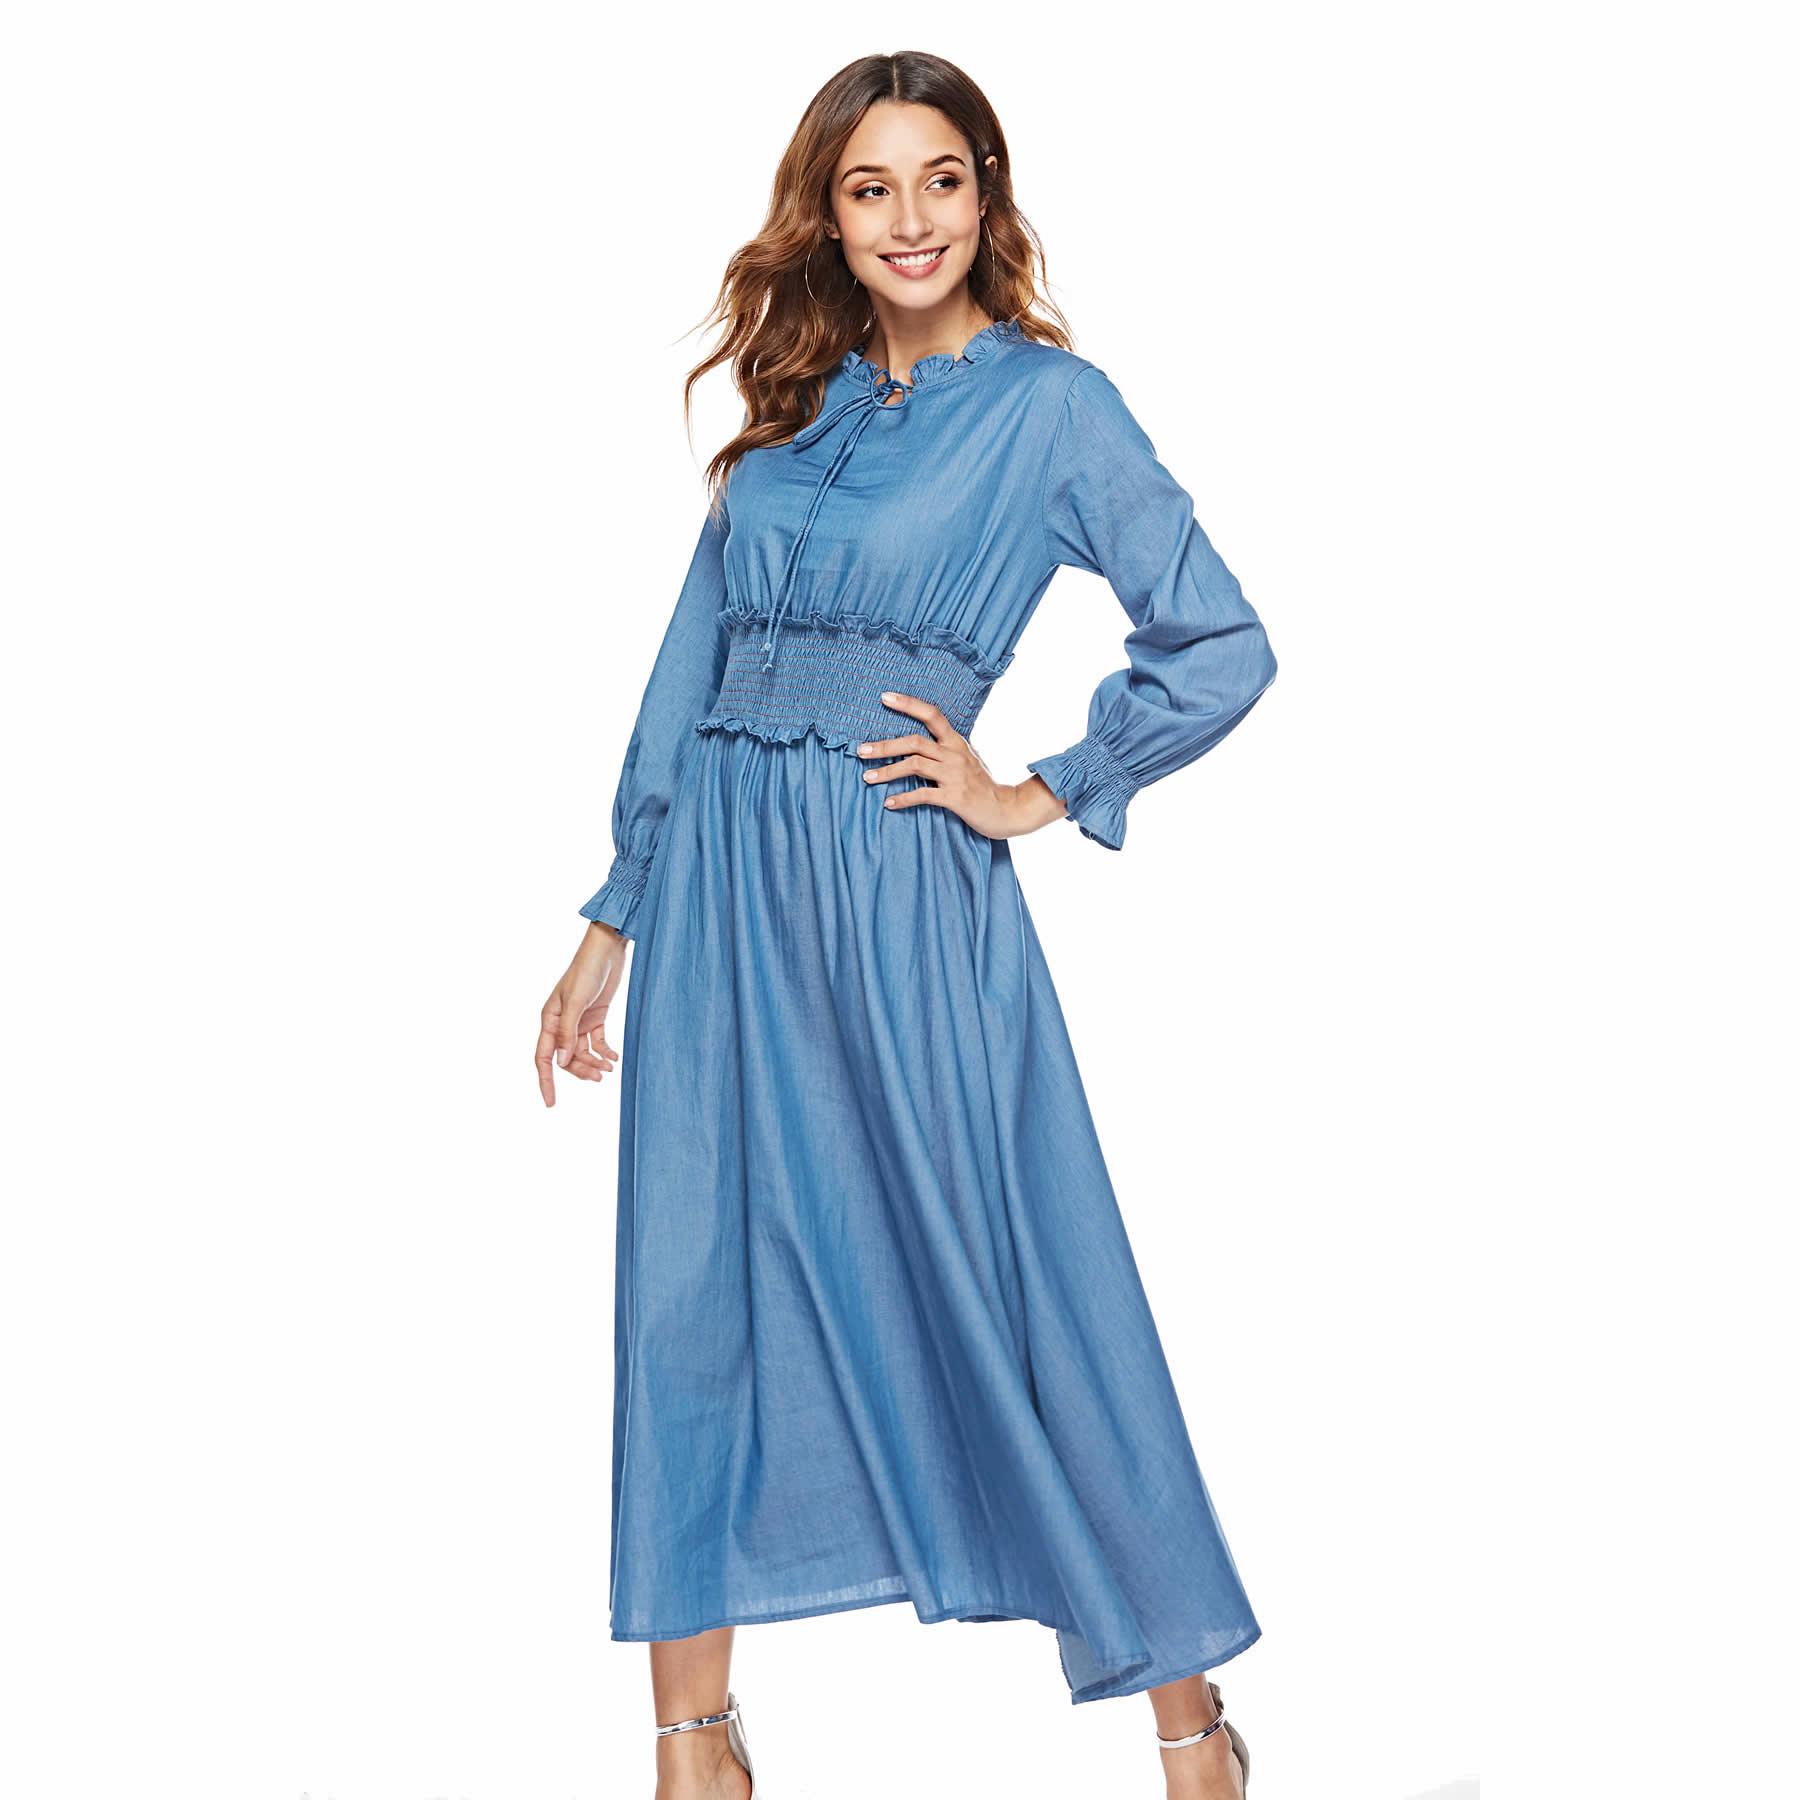 Long Denim Dress 2018 Autumn Fashion Women Long Sleeve Ankle Length Dresses Cute Womens Vestido S Xl Size